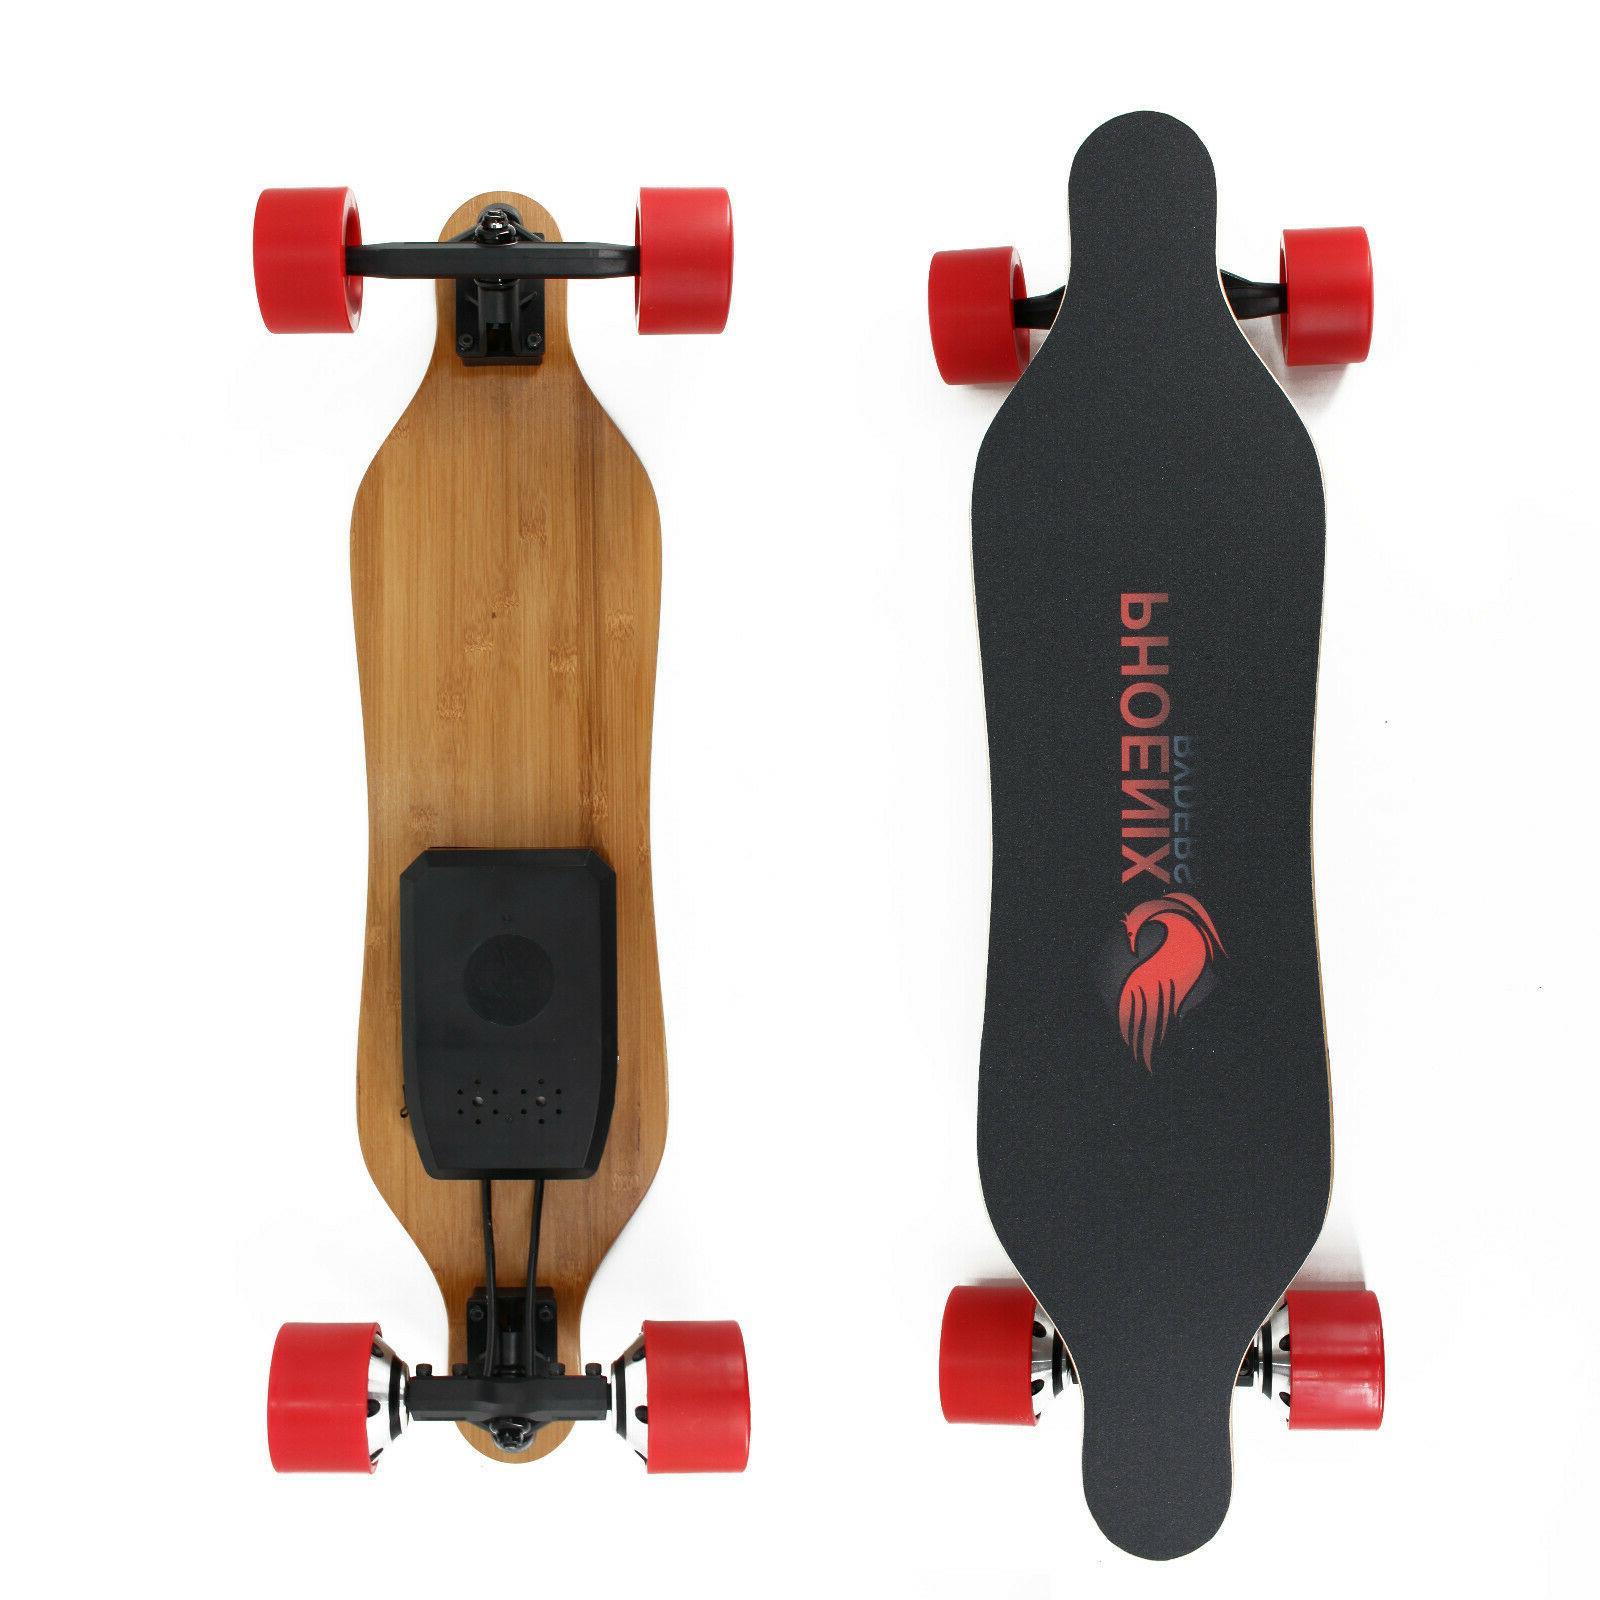 USED Skateboard Miles Dual 250 Hub Motor Longboard Remote